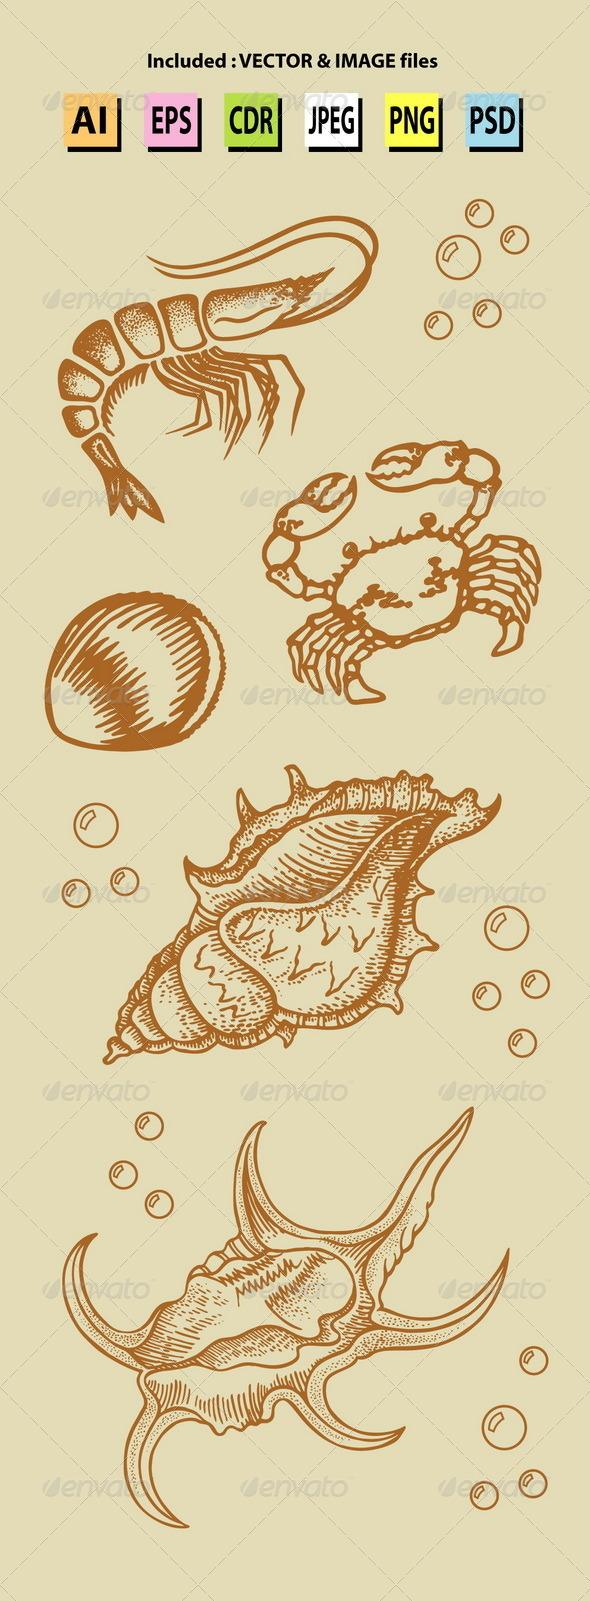 Vintage Sea Lives Sketch